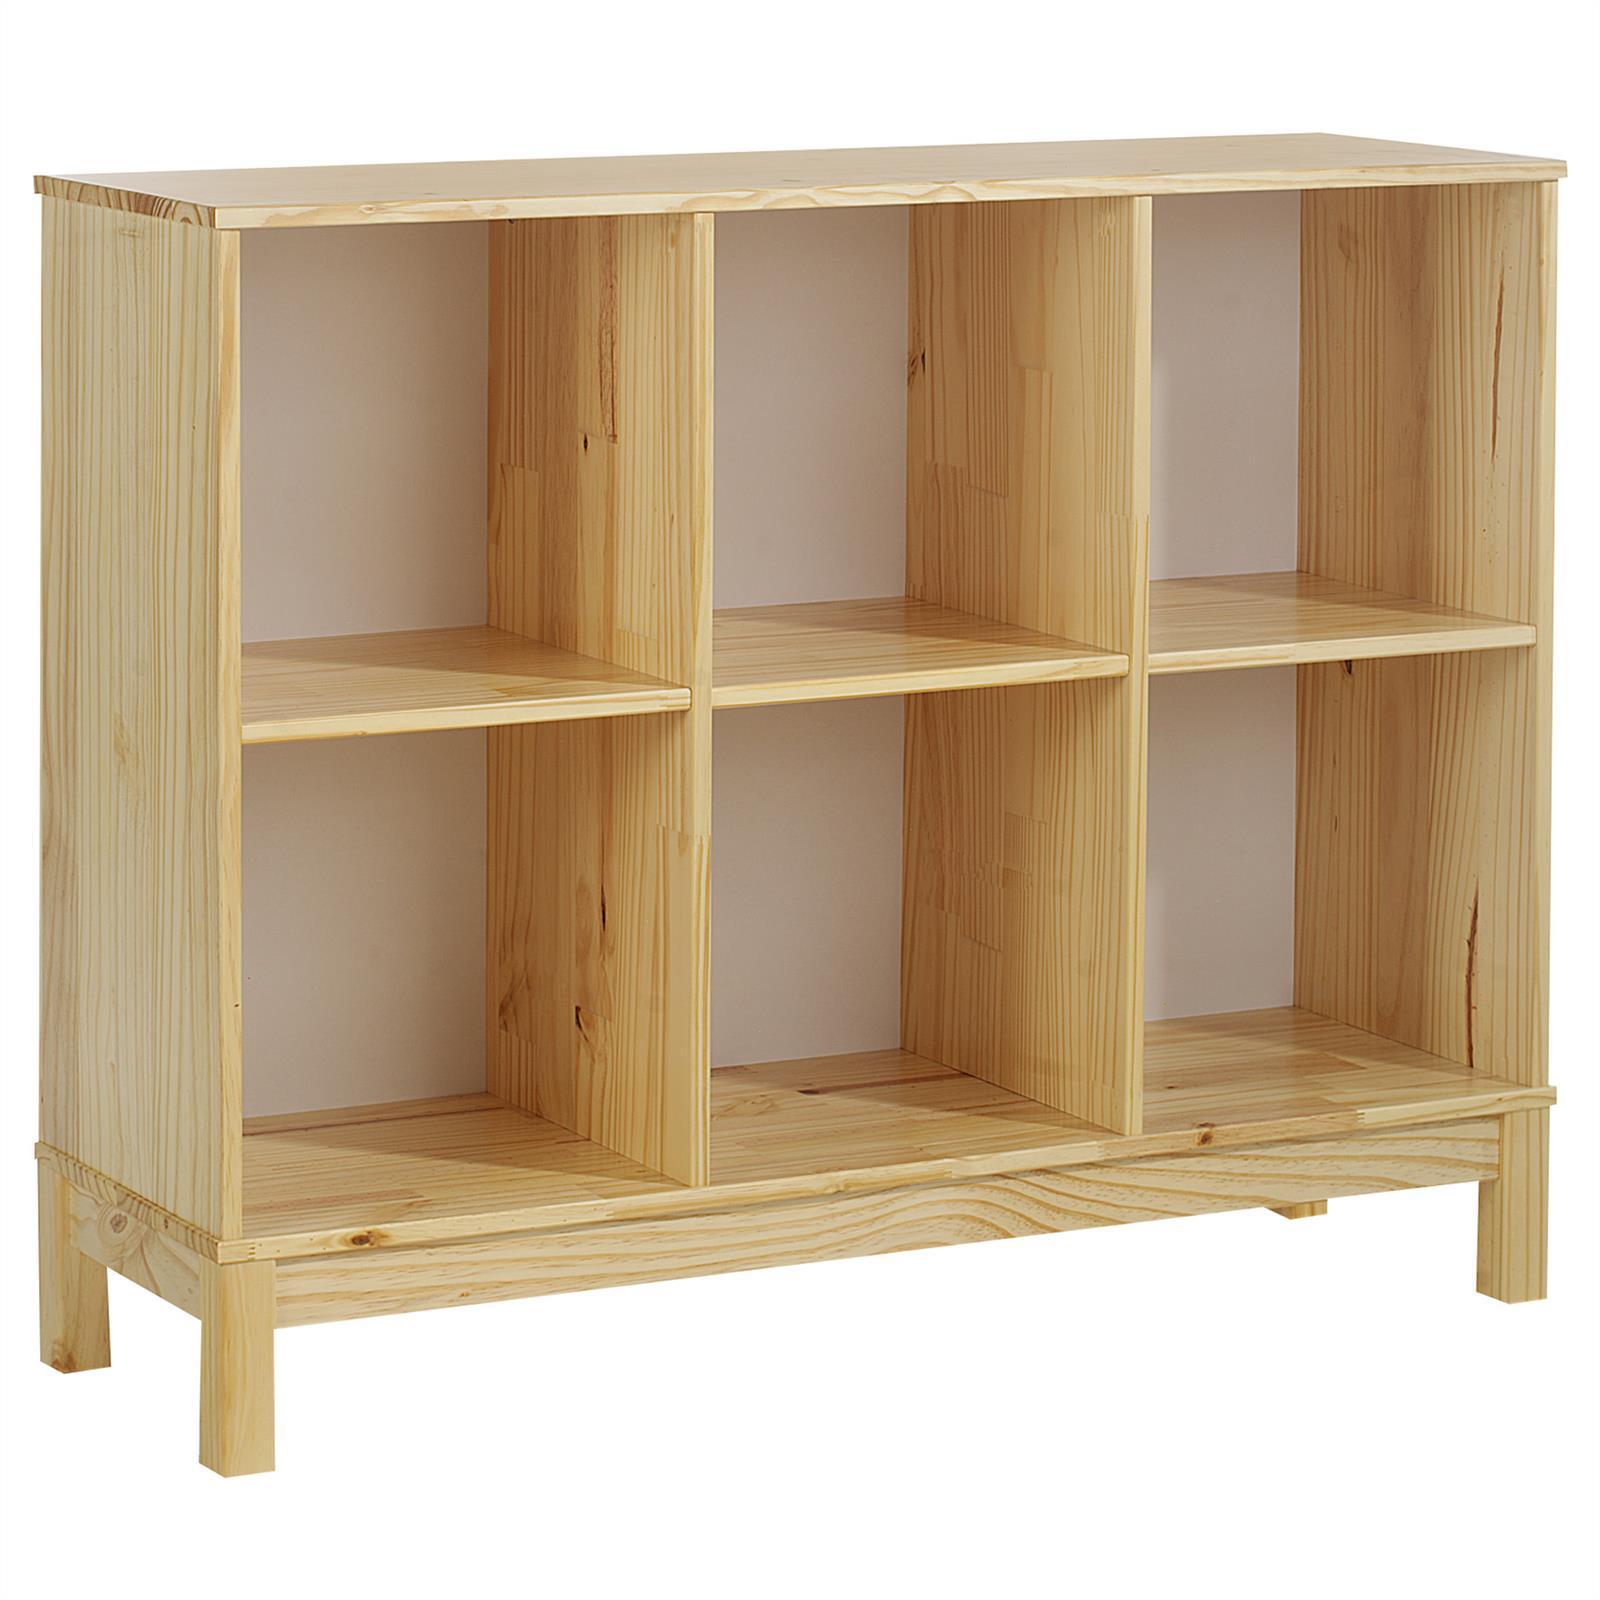 b cherregal b roregal regal standregal holzregal 6 f cher kiefer massiv lackiert ebay. Black Bedroom Furniture Sets. Home Design Ideas